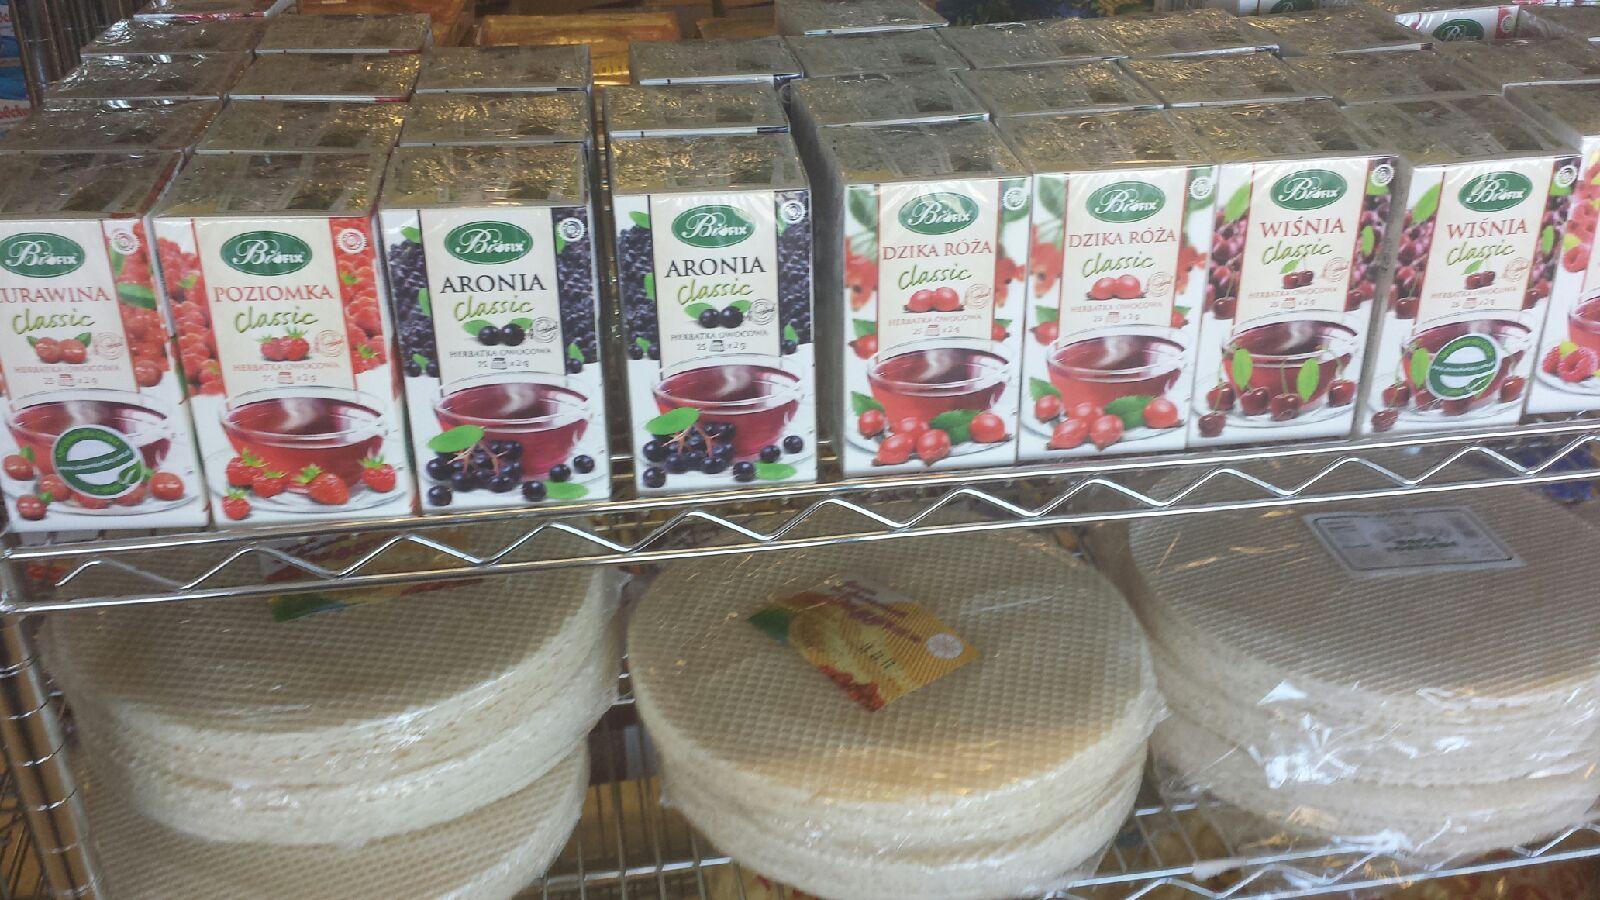 Aronia spices